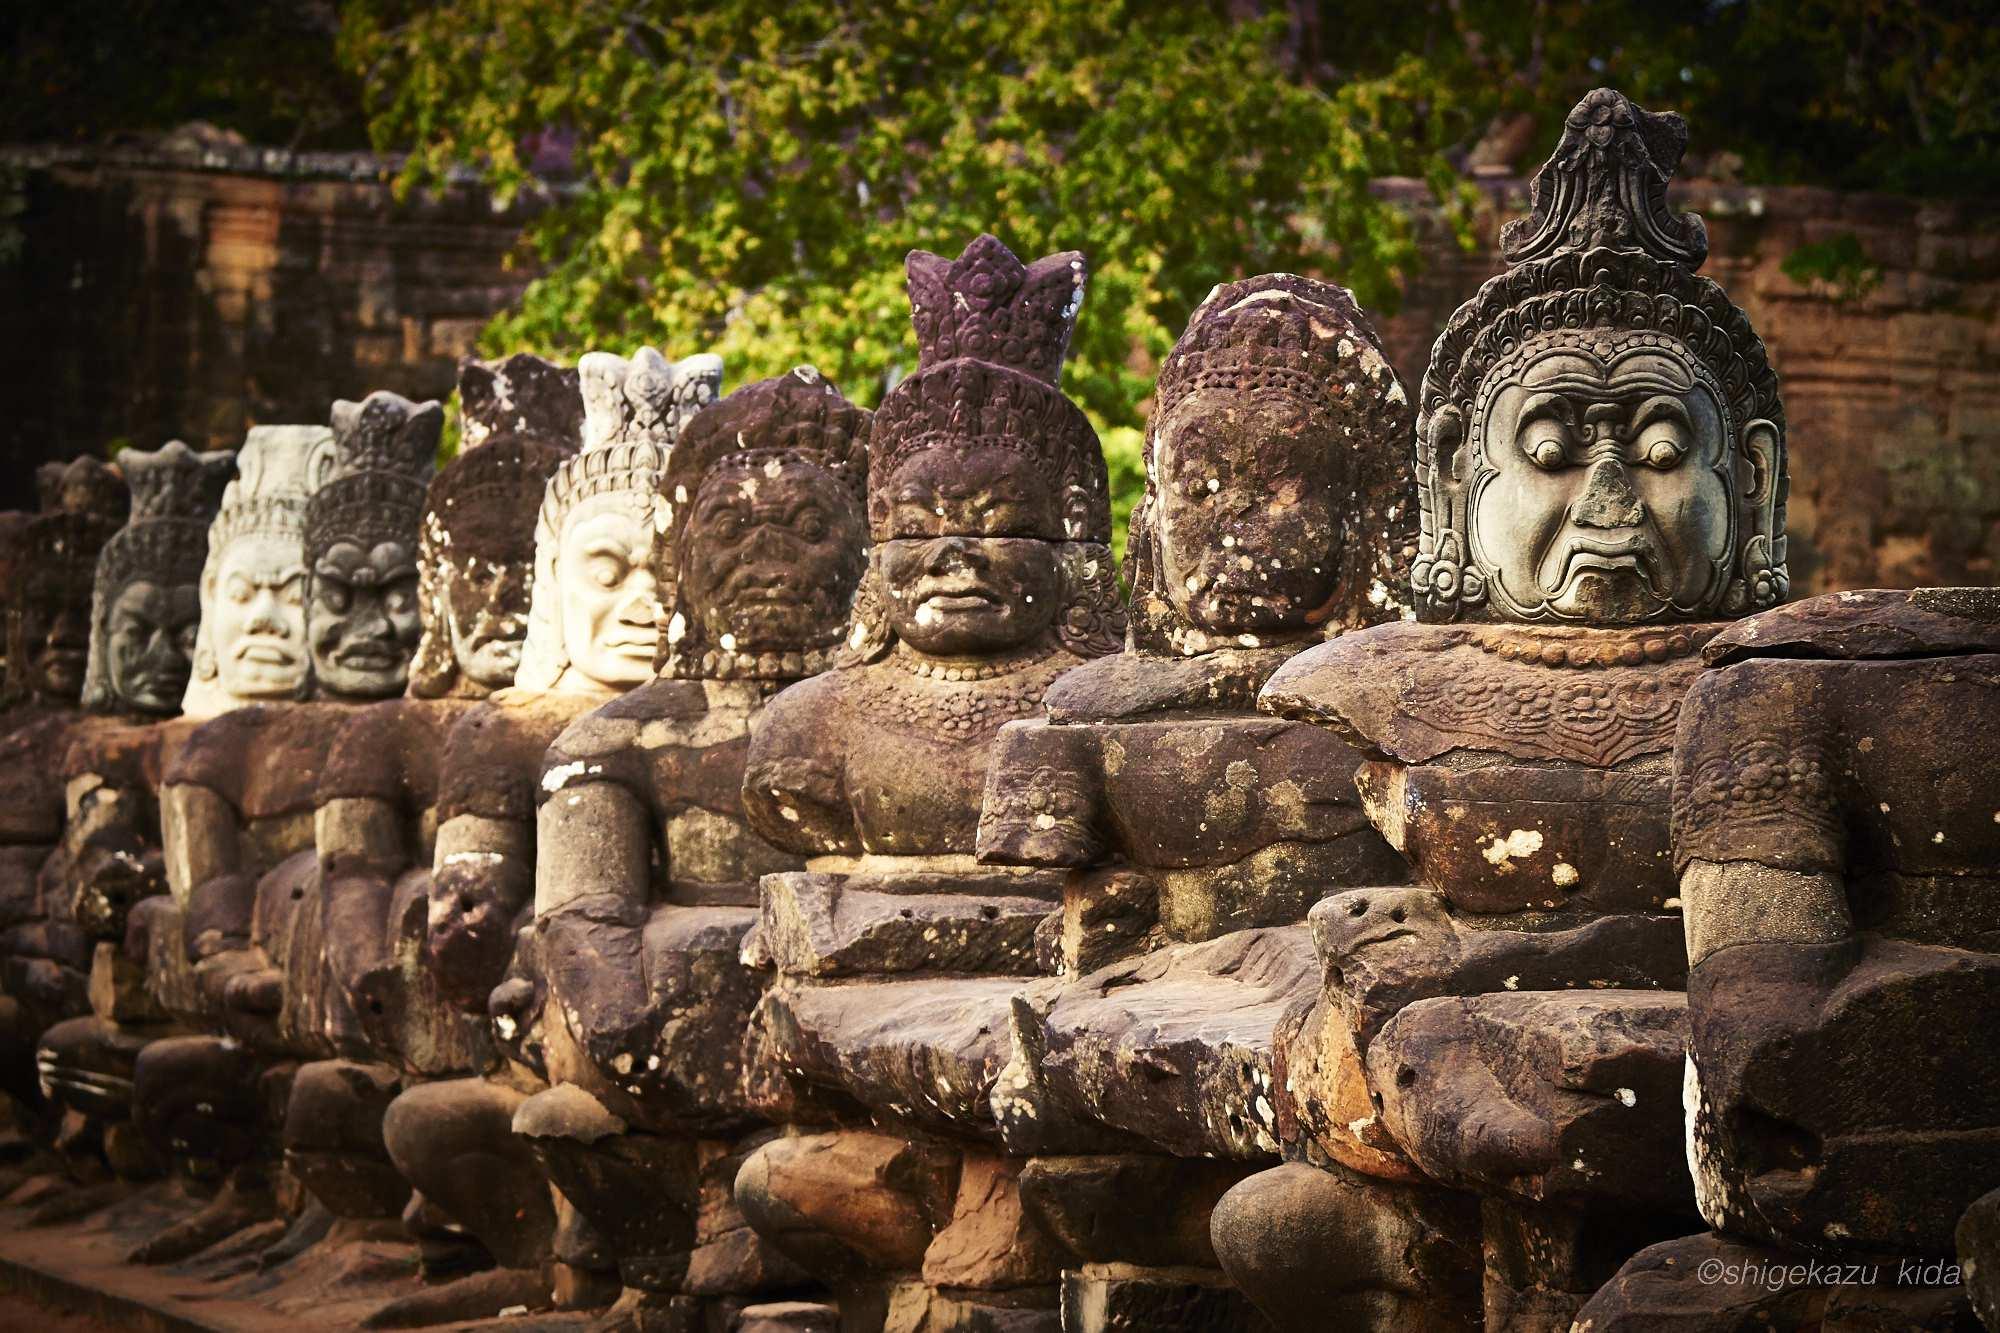 Angkor(アンコール)遺跡群にあるAngkorTohm(アンコール・トム)のSouthernGate(南大門)